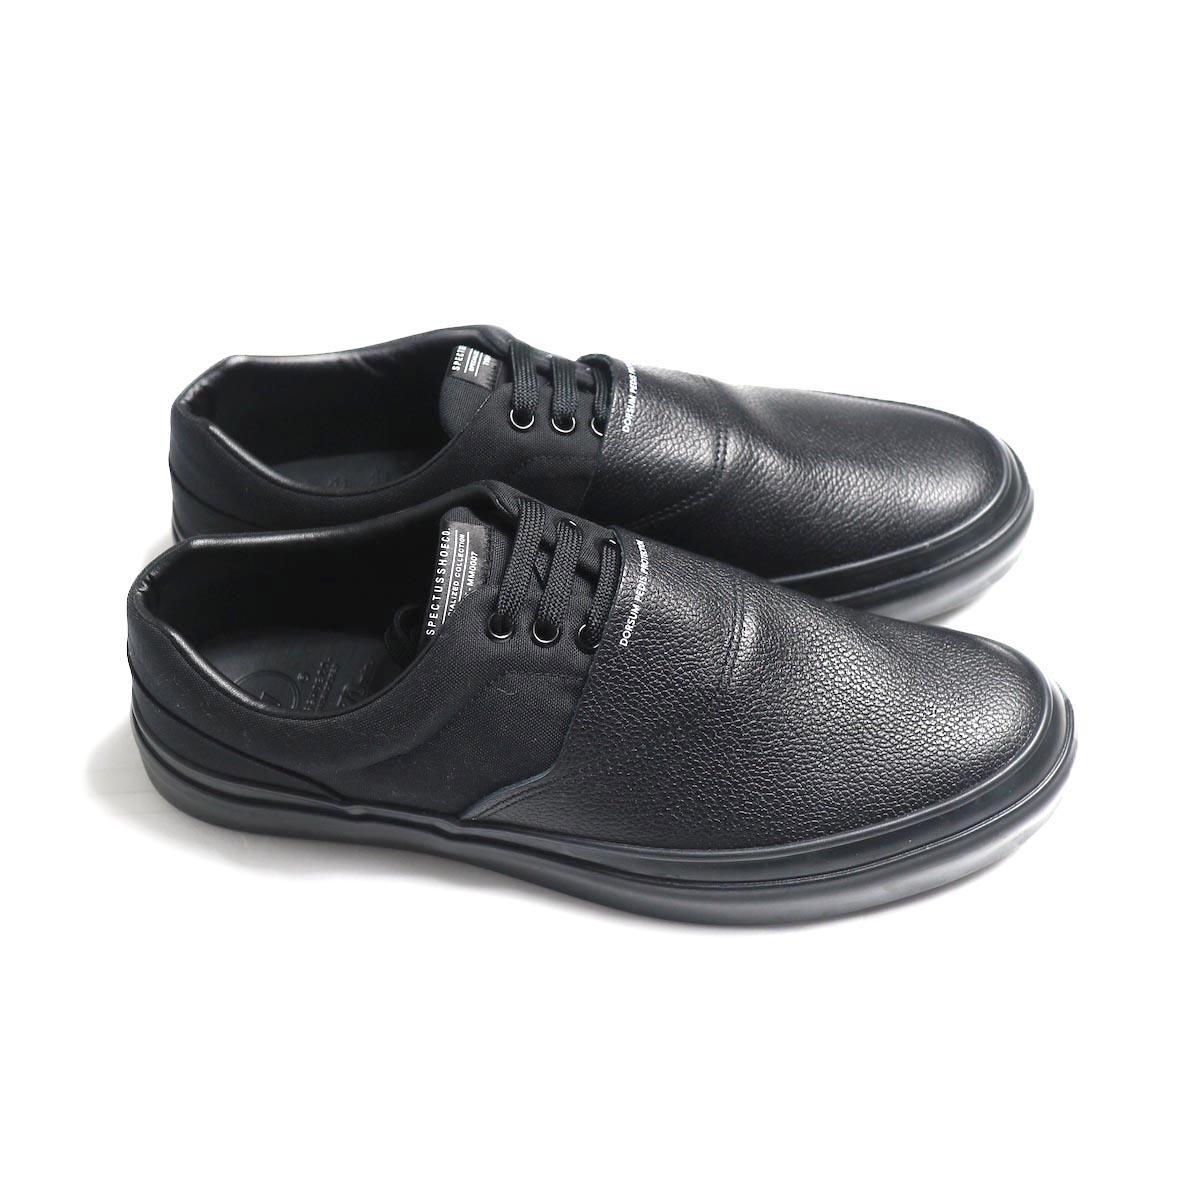 SPECTUSSHOECO. / Solid Kicks 07 -Black(SSC1912004) サイド